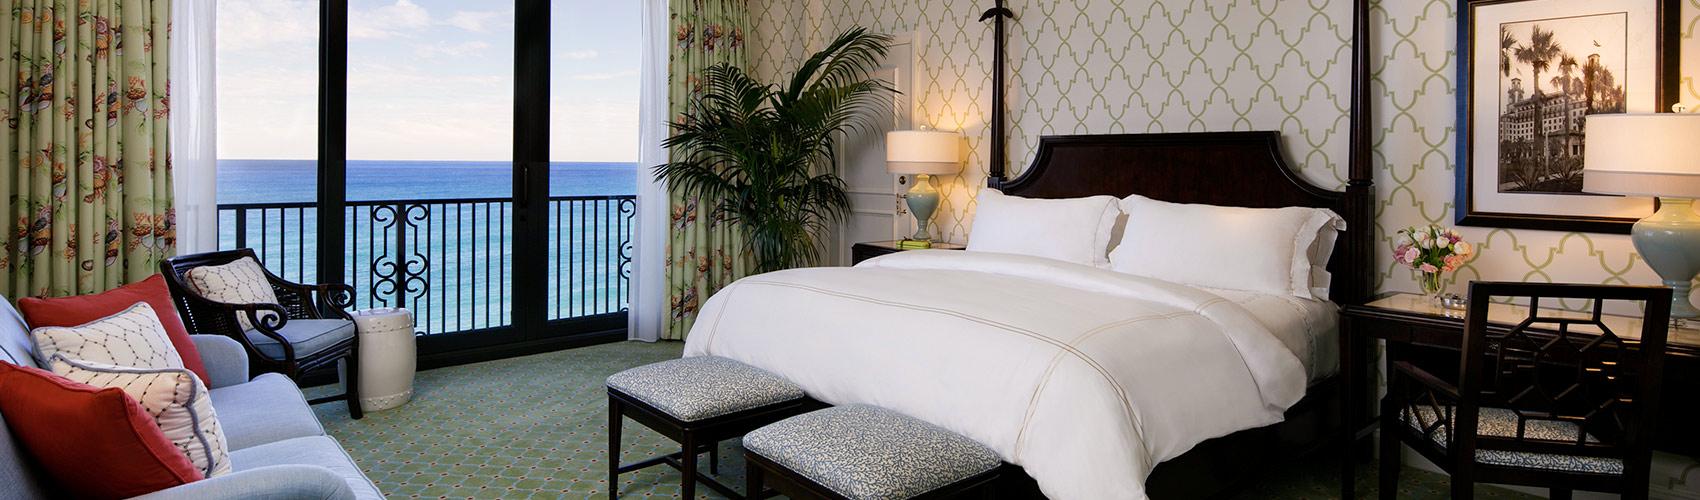 Atlantic guest room bed